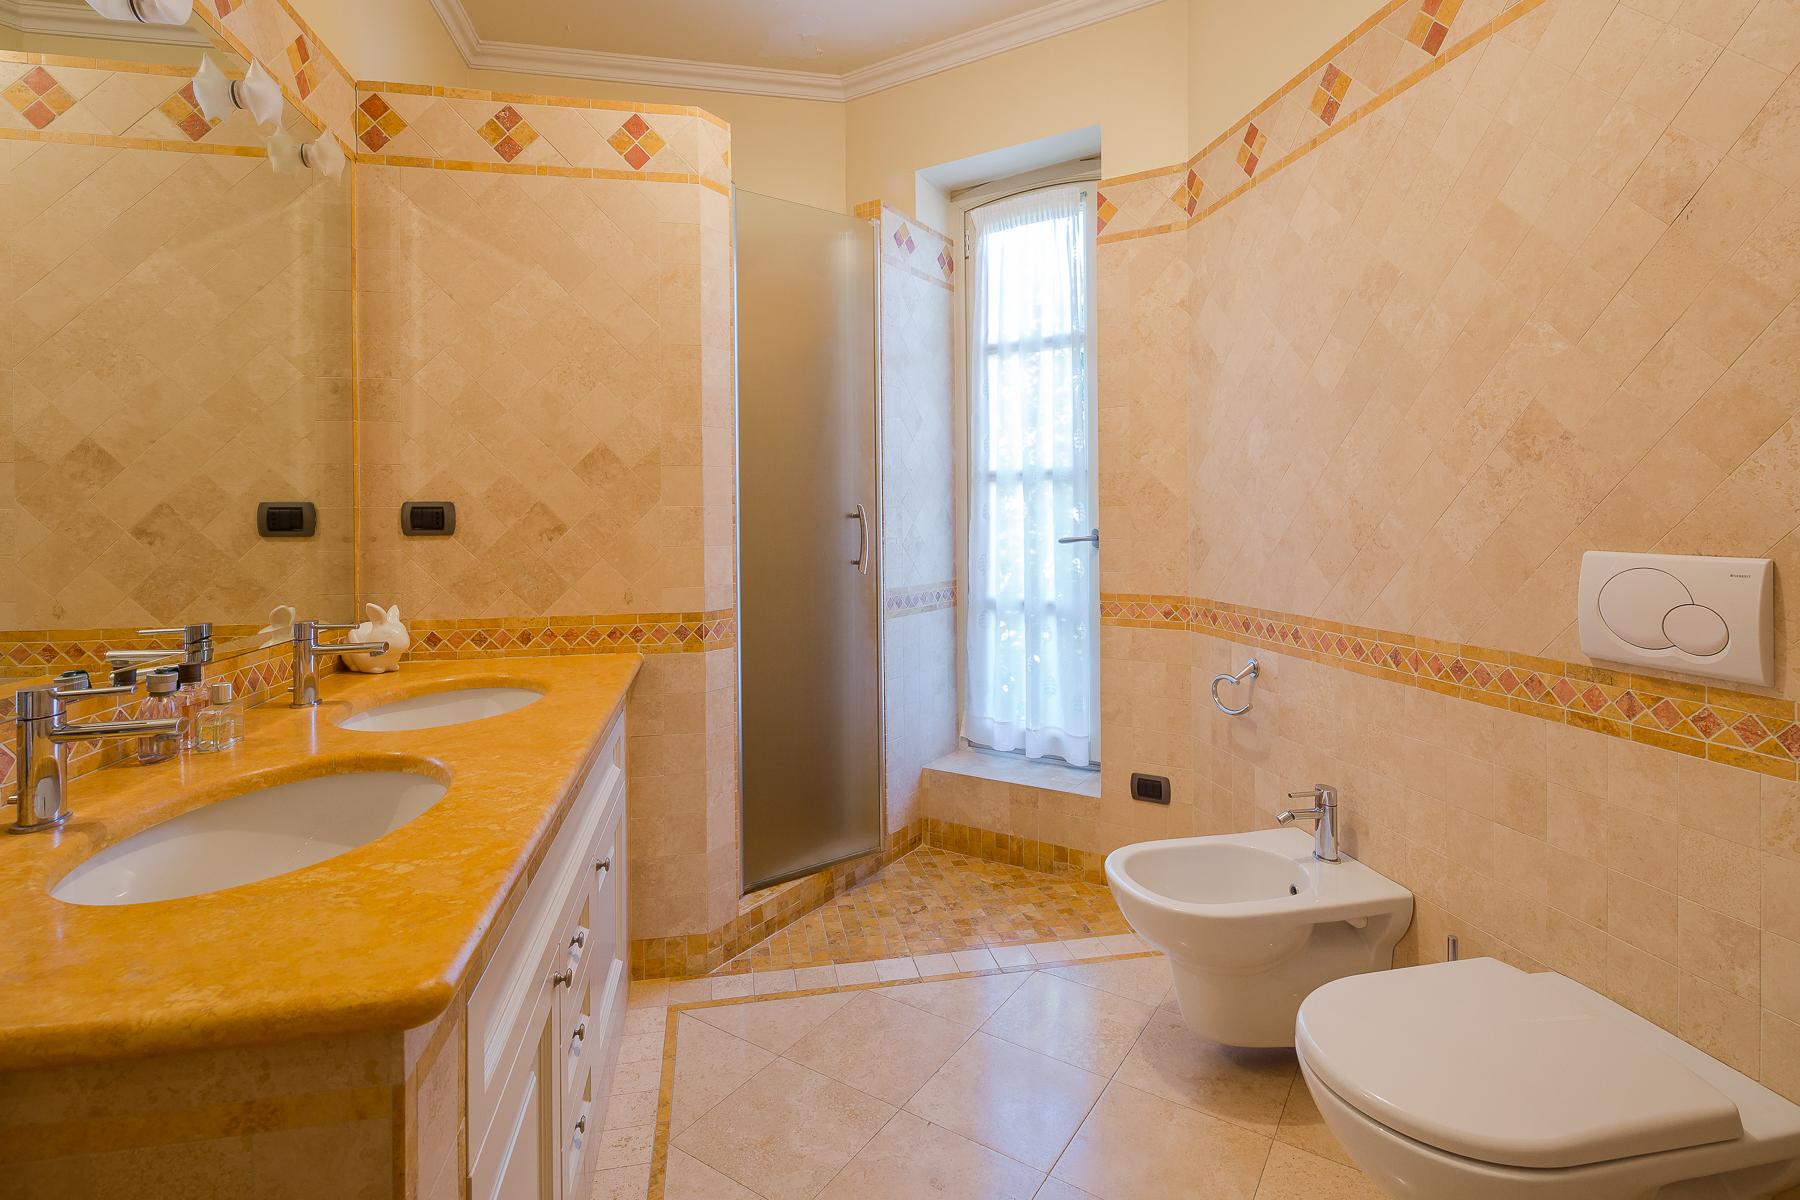 Villa in Vendita a Varese: 5 locali, 470 mq - Foto 19